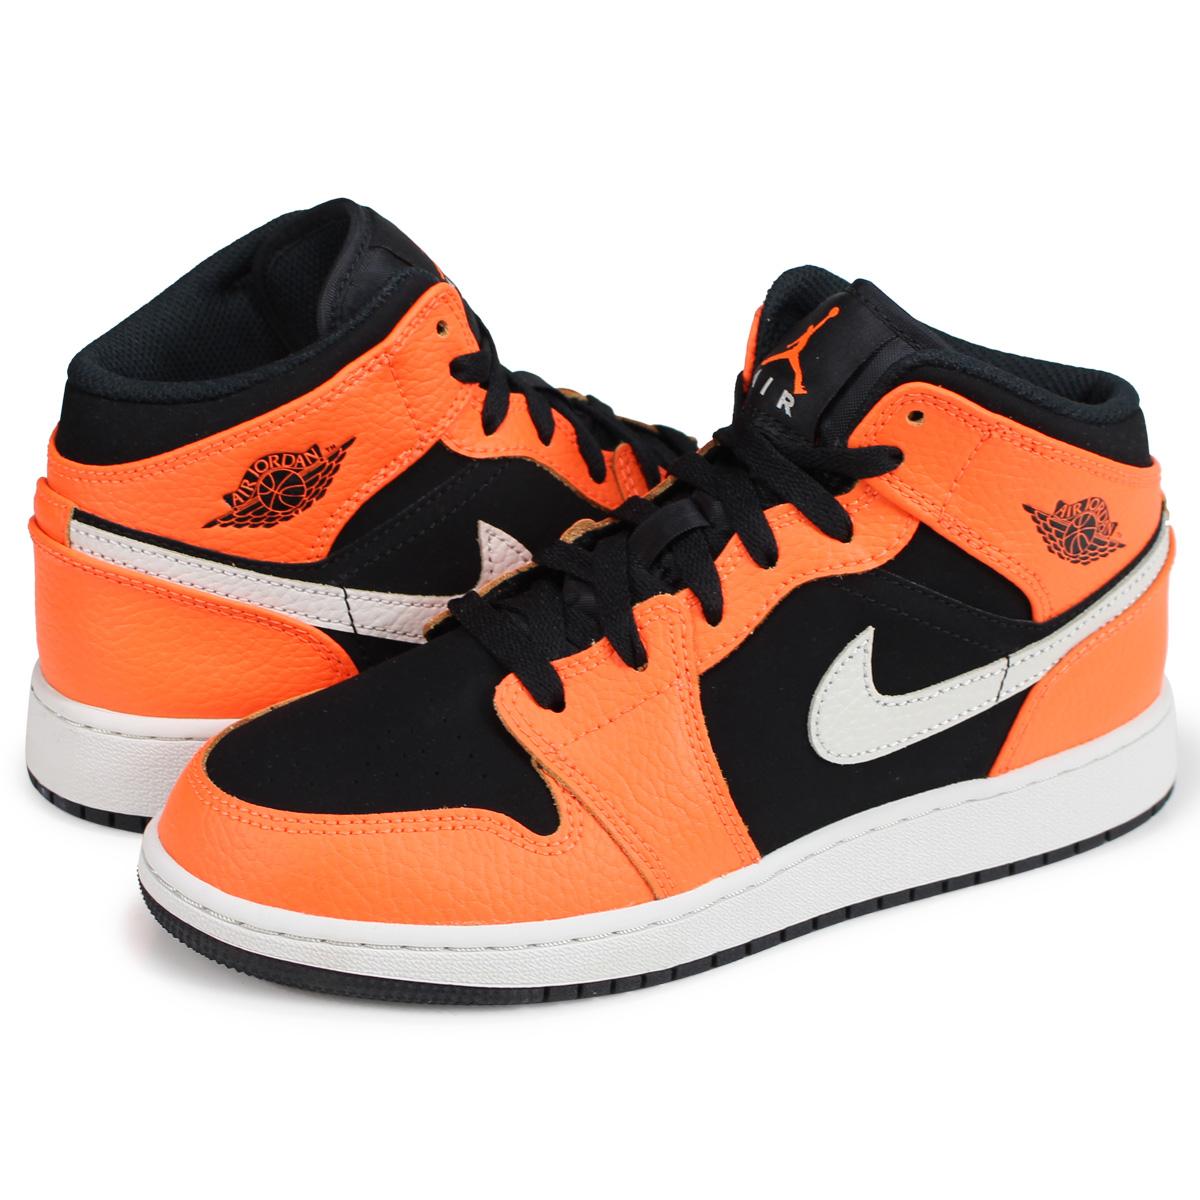 eac394a6ecb Whats up Sports  NIKE AIR JORDAN 1 MID GS Nike Air Jordan 1 Lady s ...